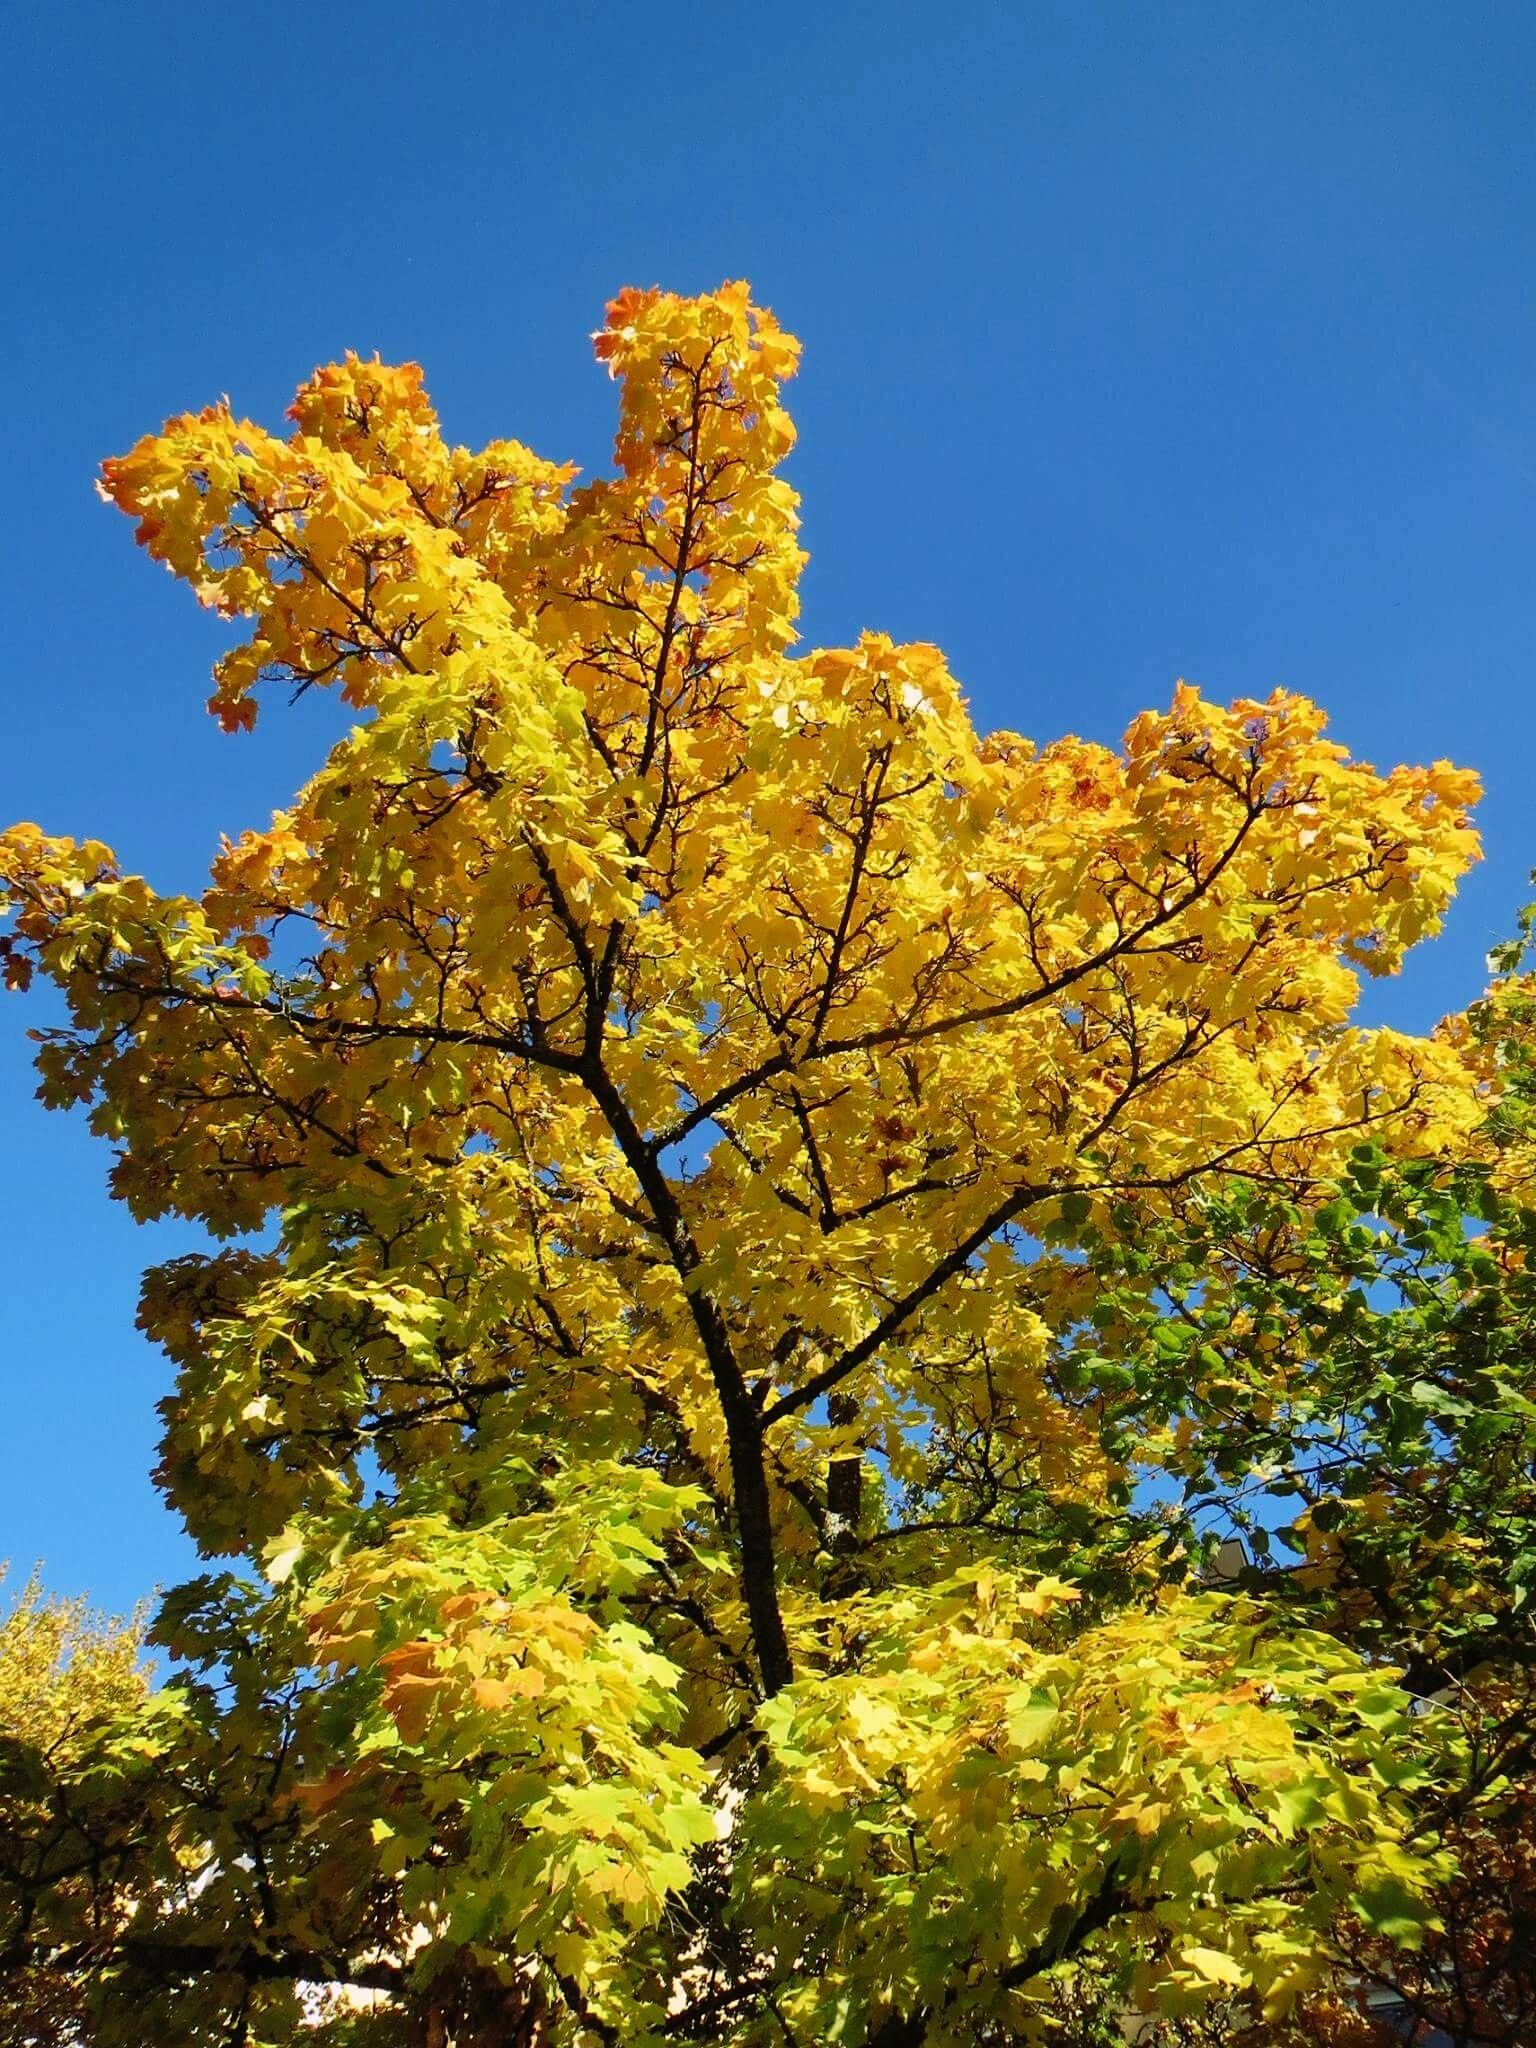 my tipe of Autumn by Iri Rusu